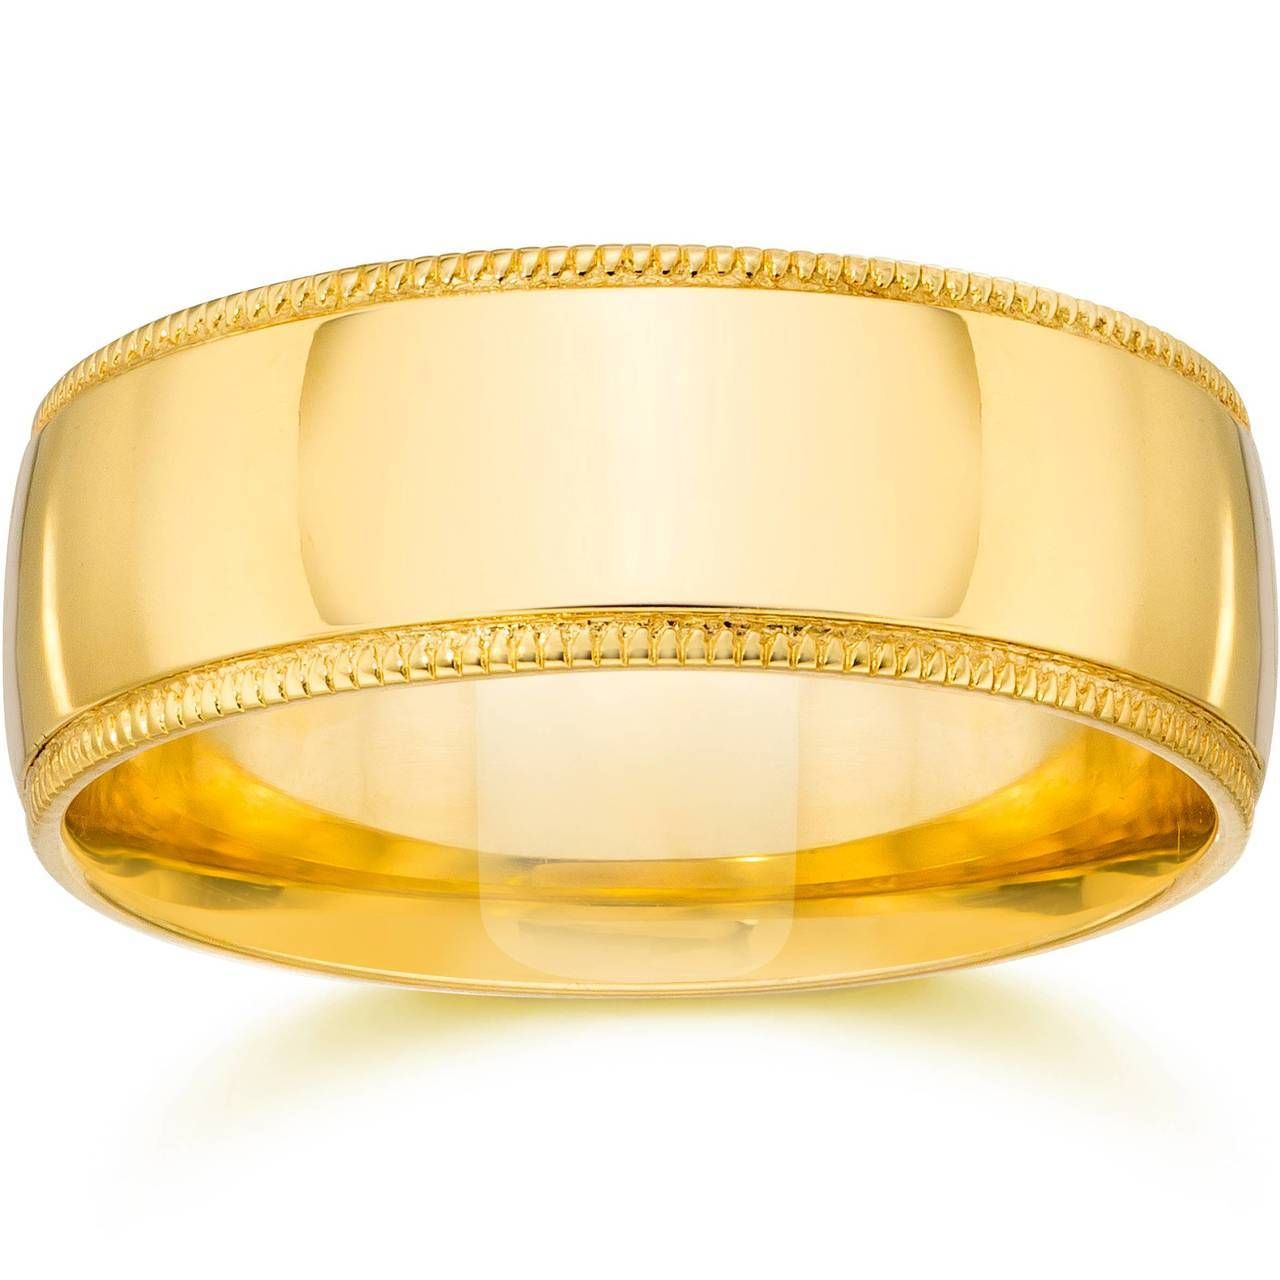 Milgrain Comfort Fit Wedding Band 14k Yellow Gold Yellow Gold Mens Wedding Ring Milgrain Wedding Bands Mens Gold Wedding Band